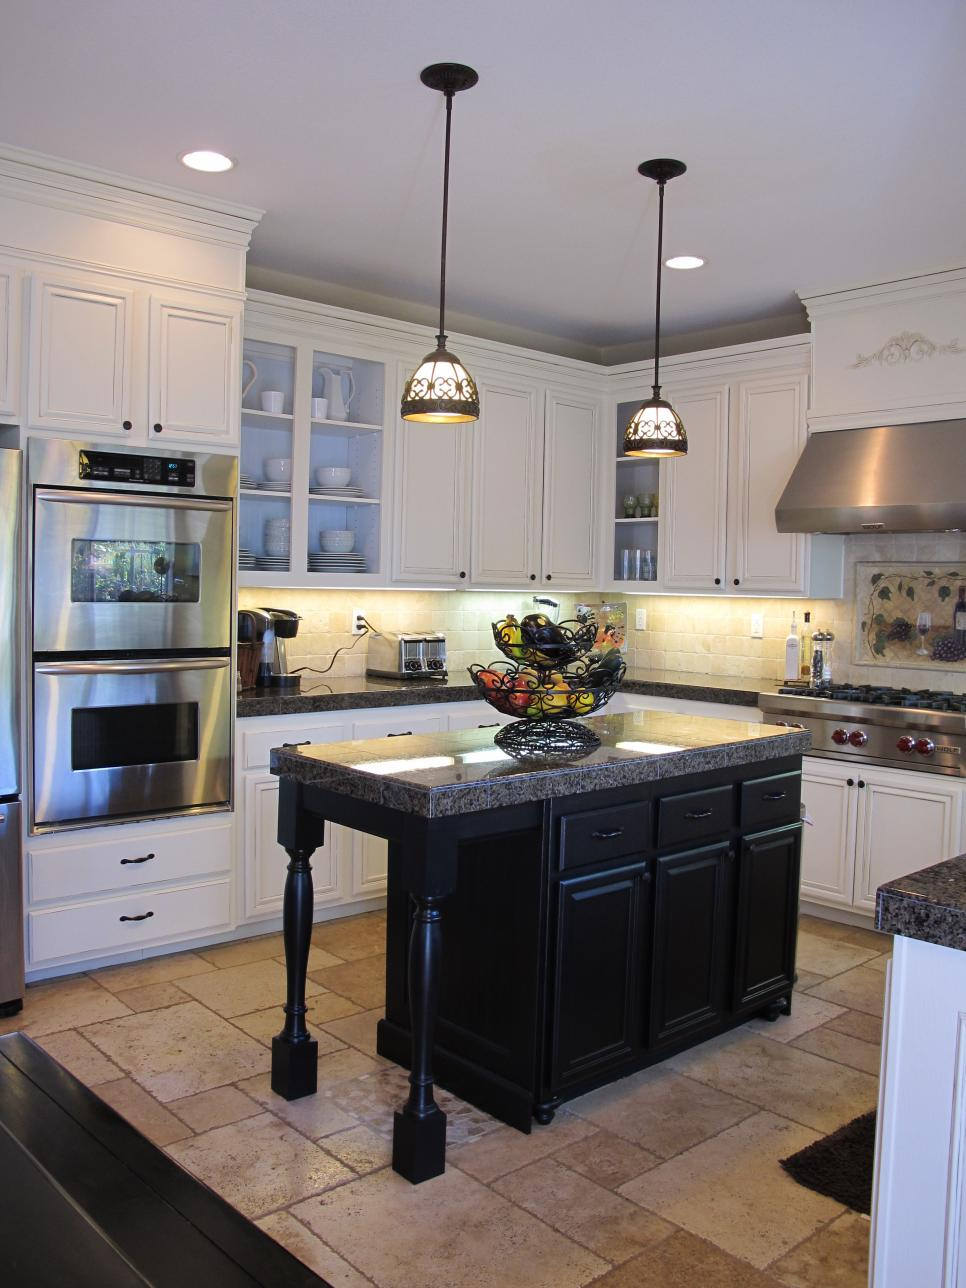 painted kitchen cabinet ideas white photo - 1